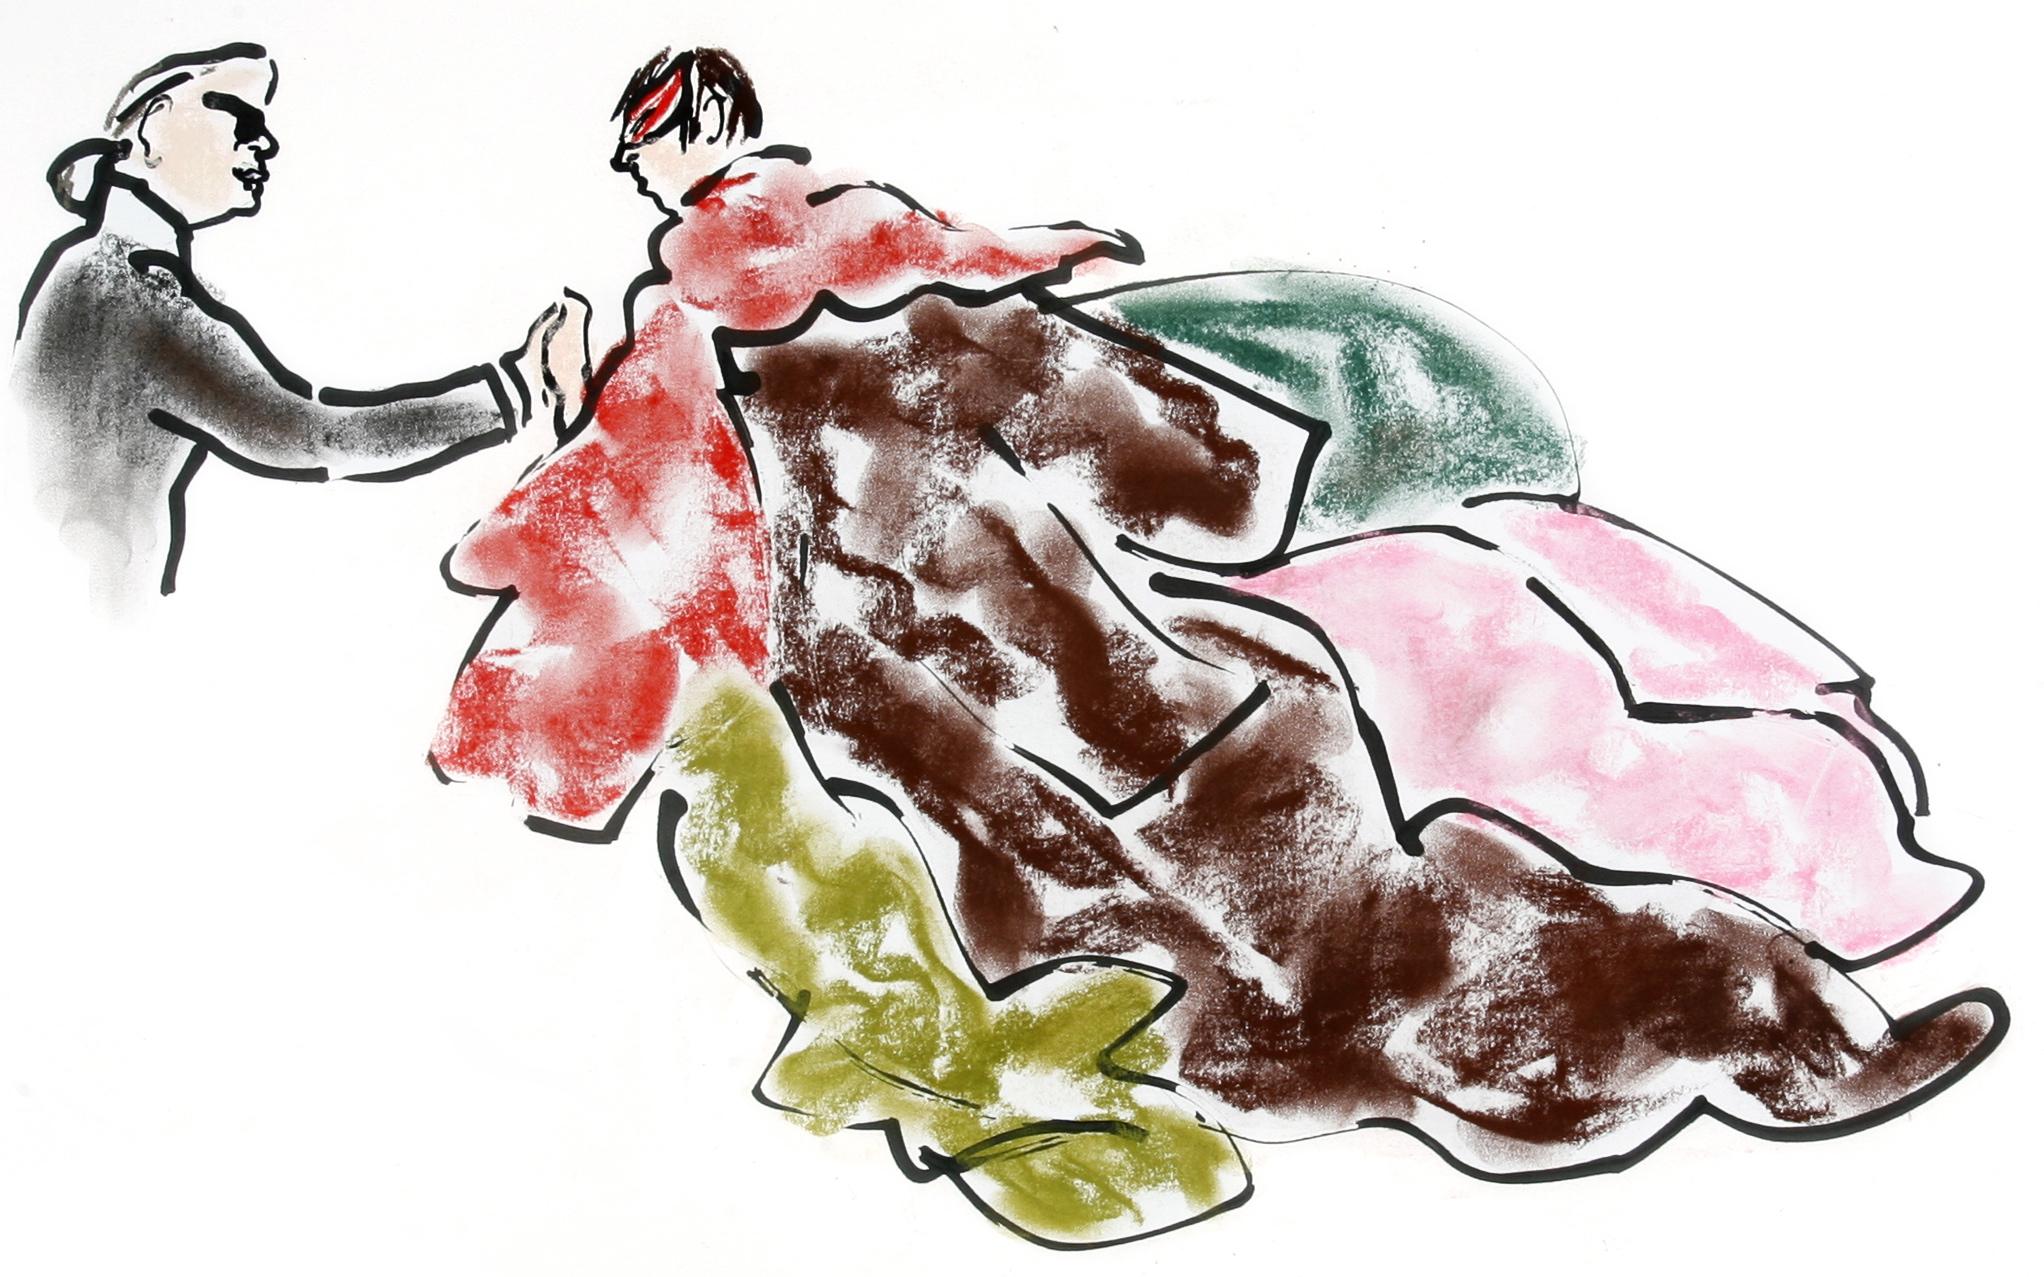 Illustration by Gladys Perint Palmer